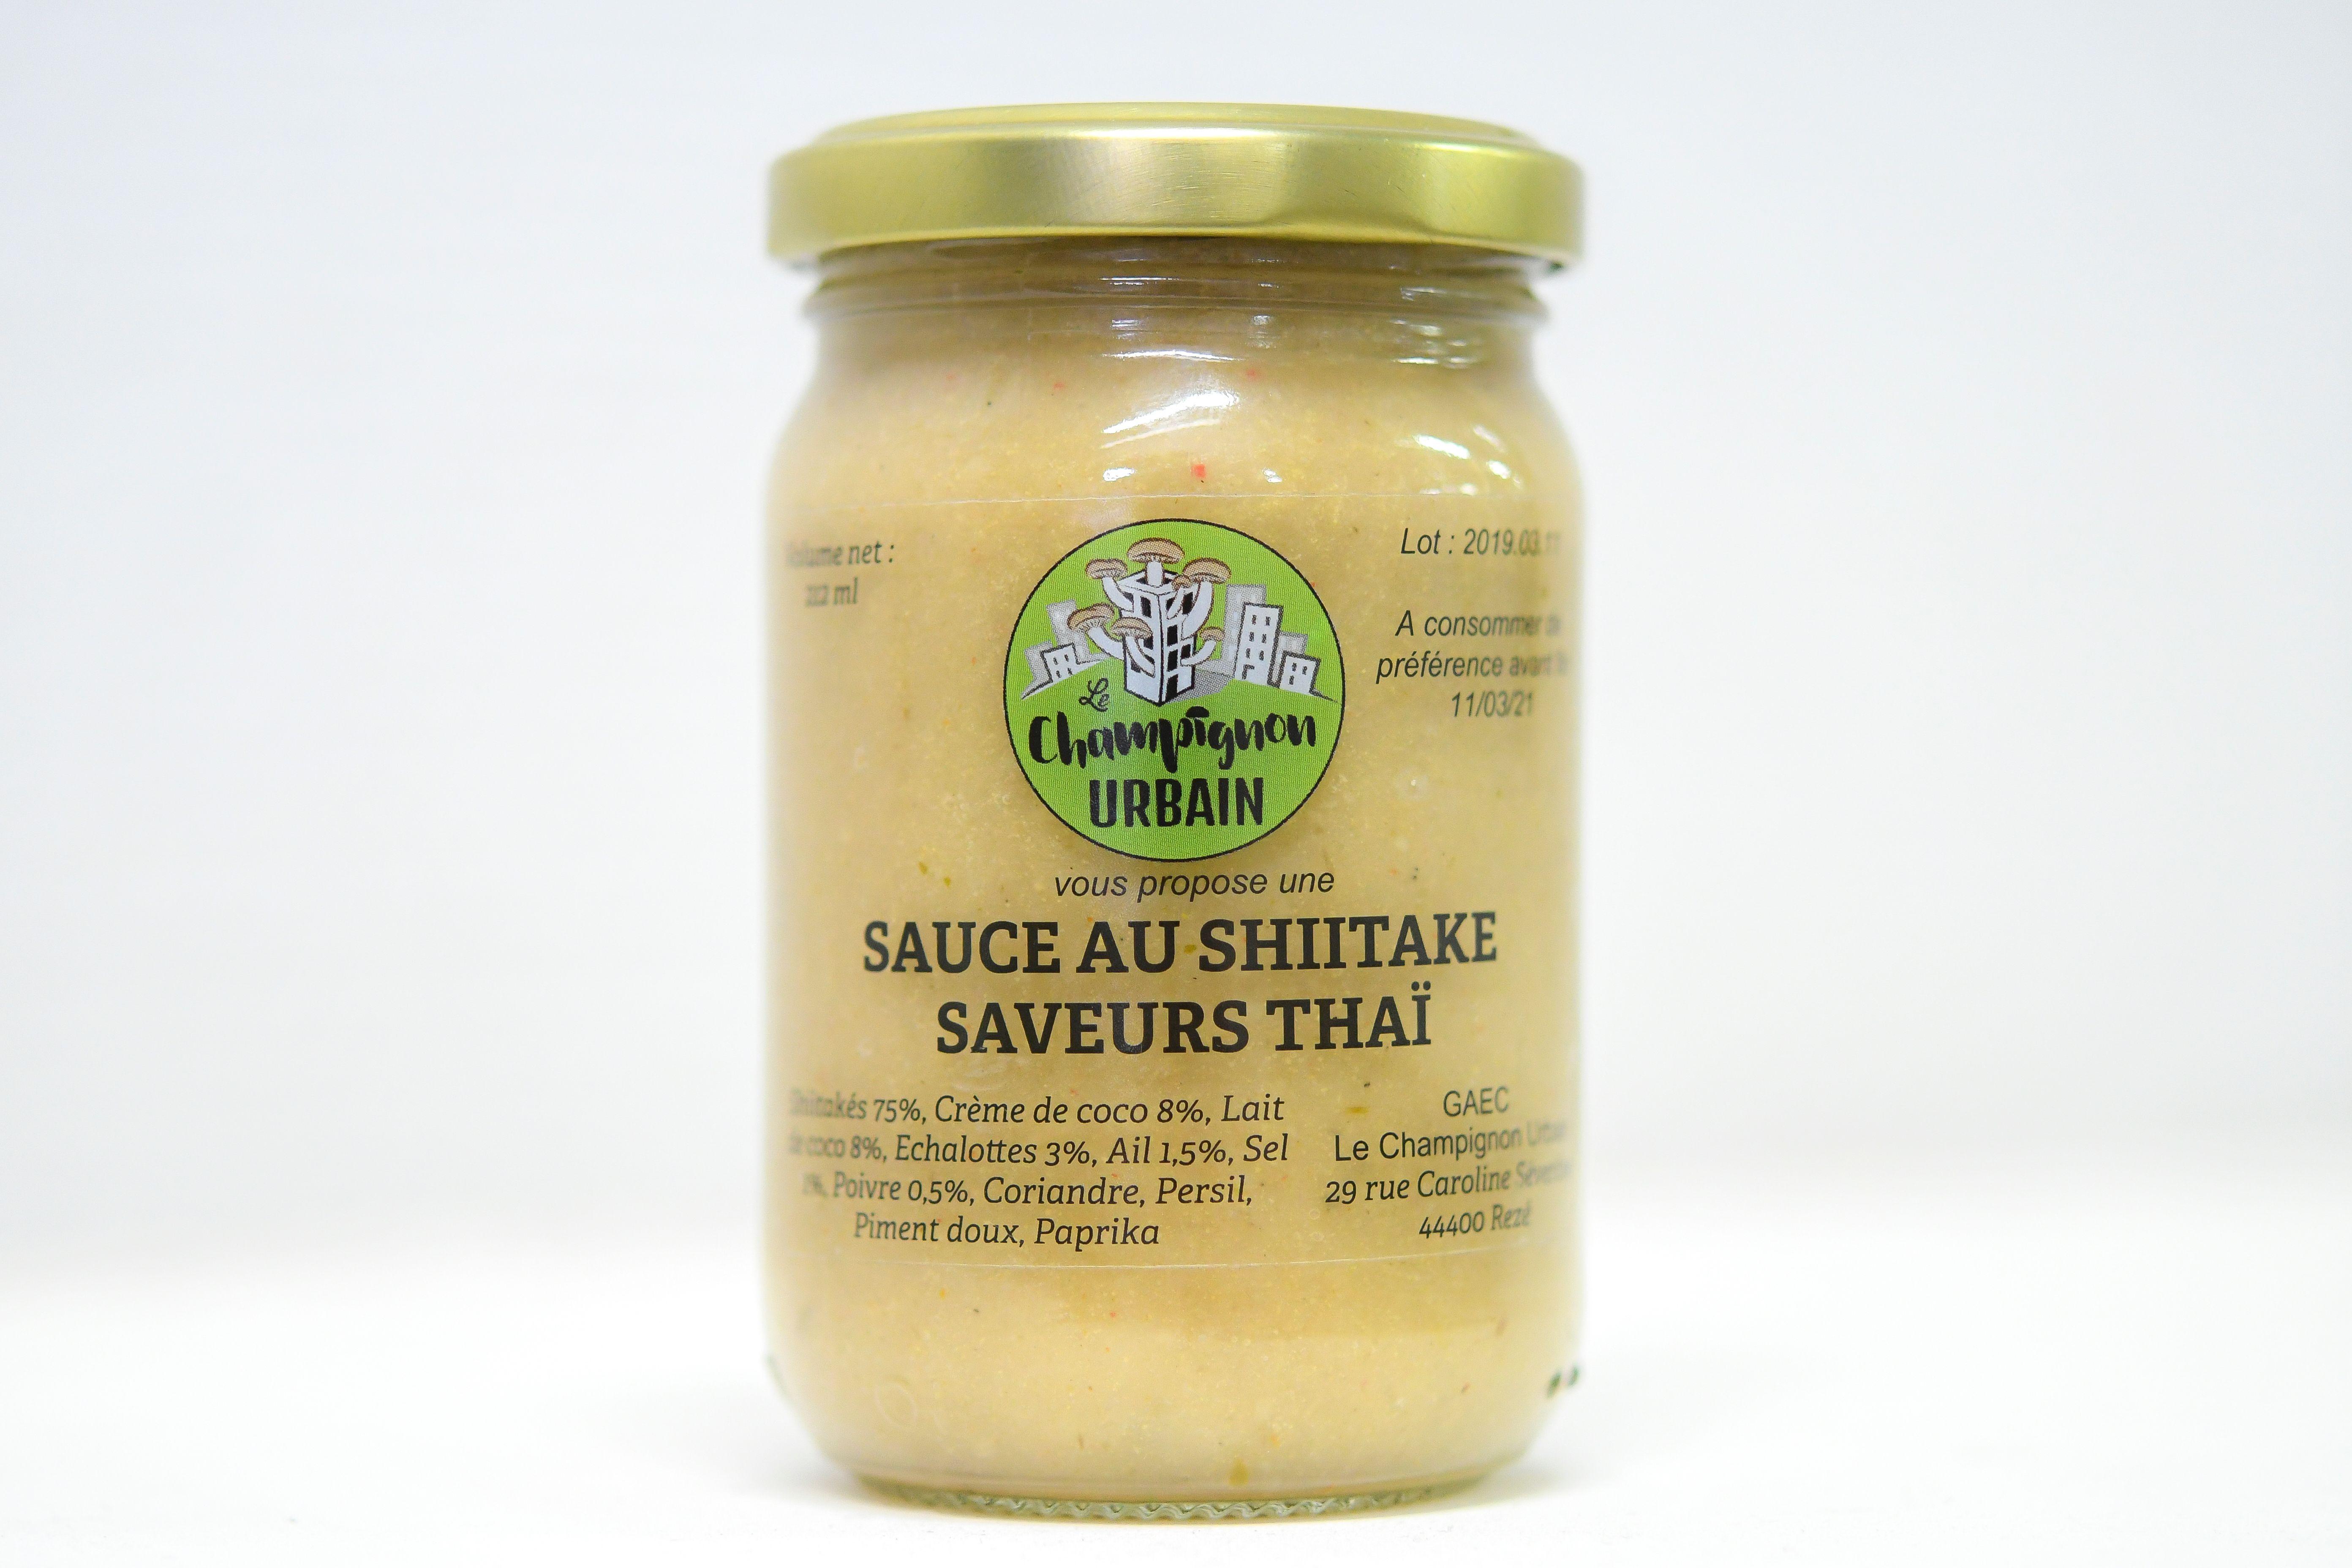 Sauce au shiitake saveur thai